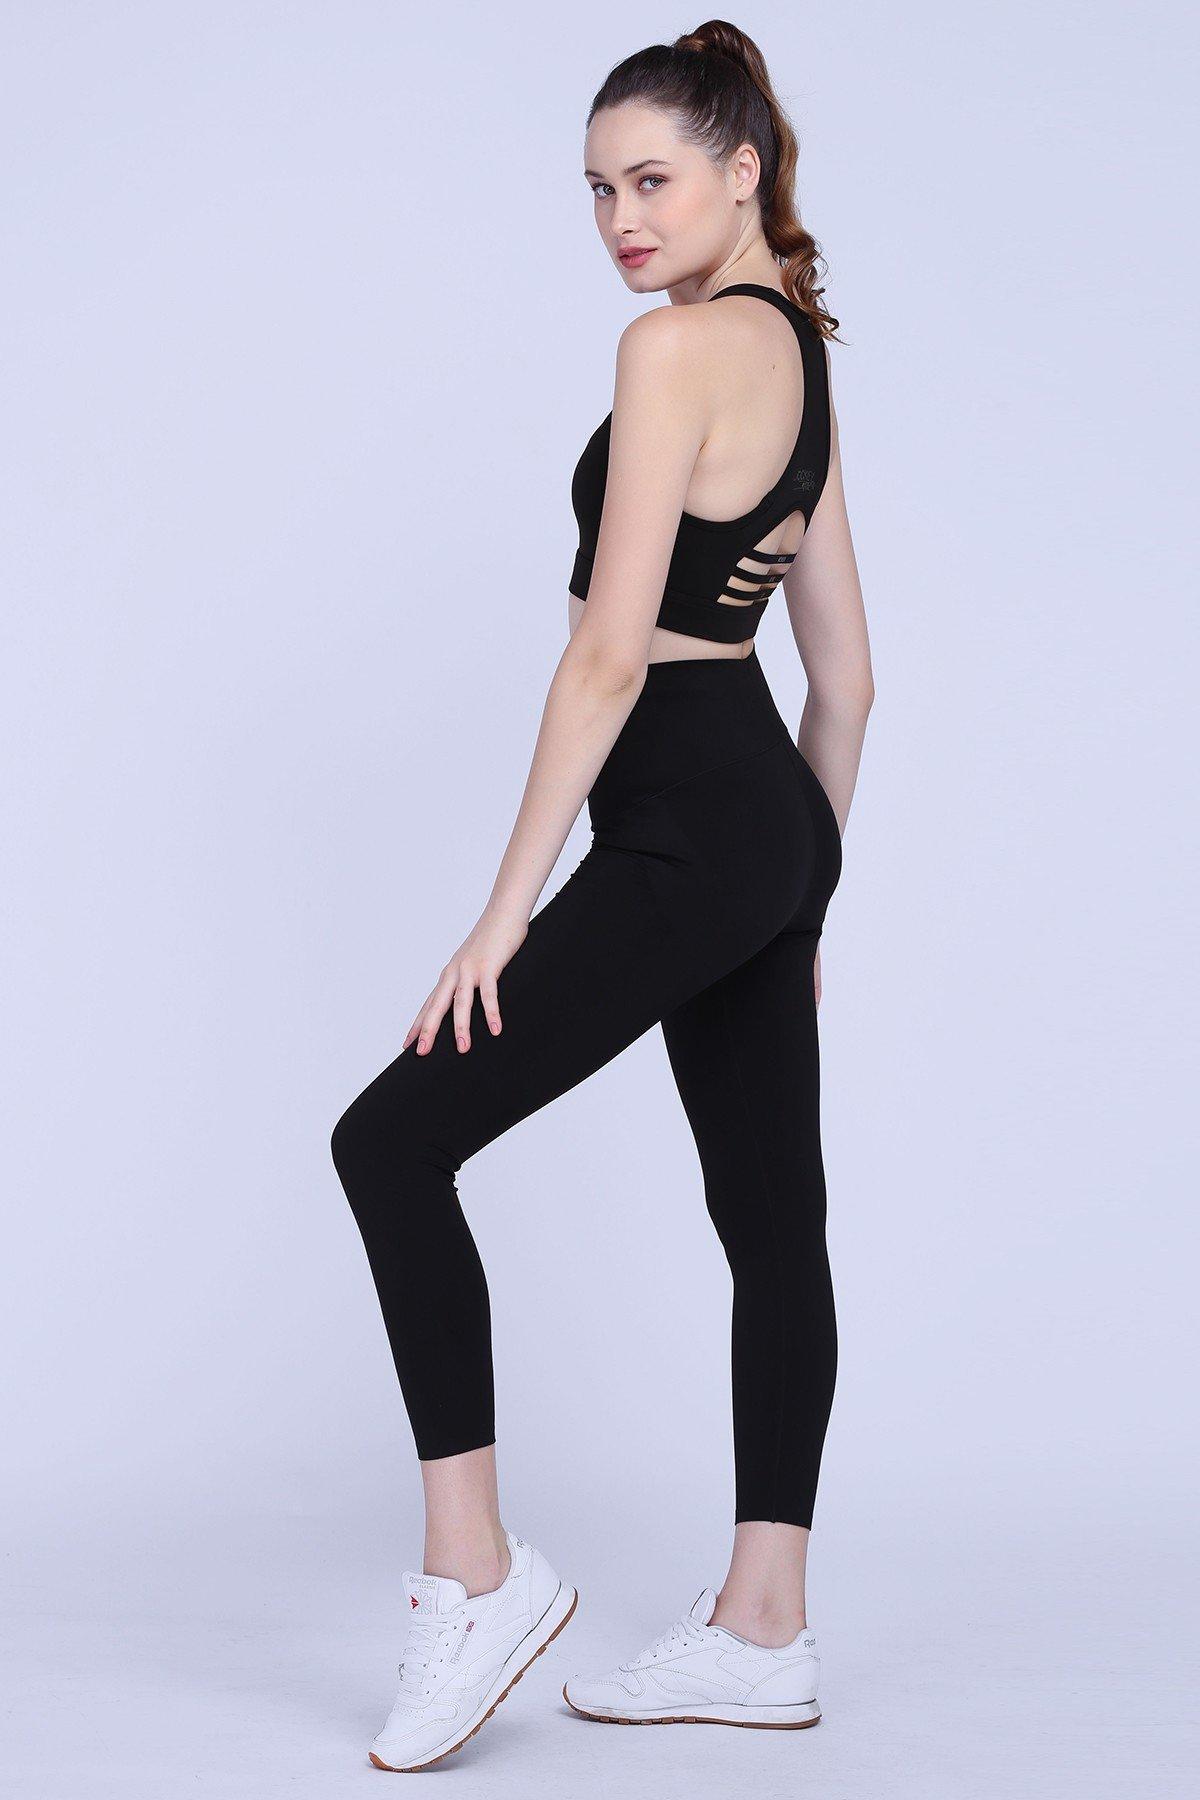 Quần legging thể thao Jockey lưng cao - 0228